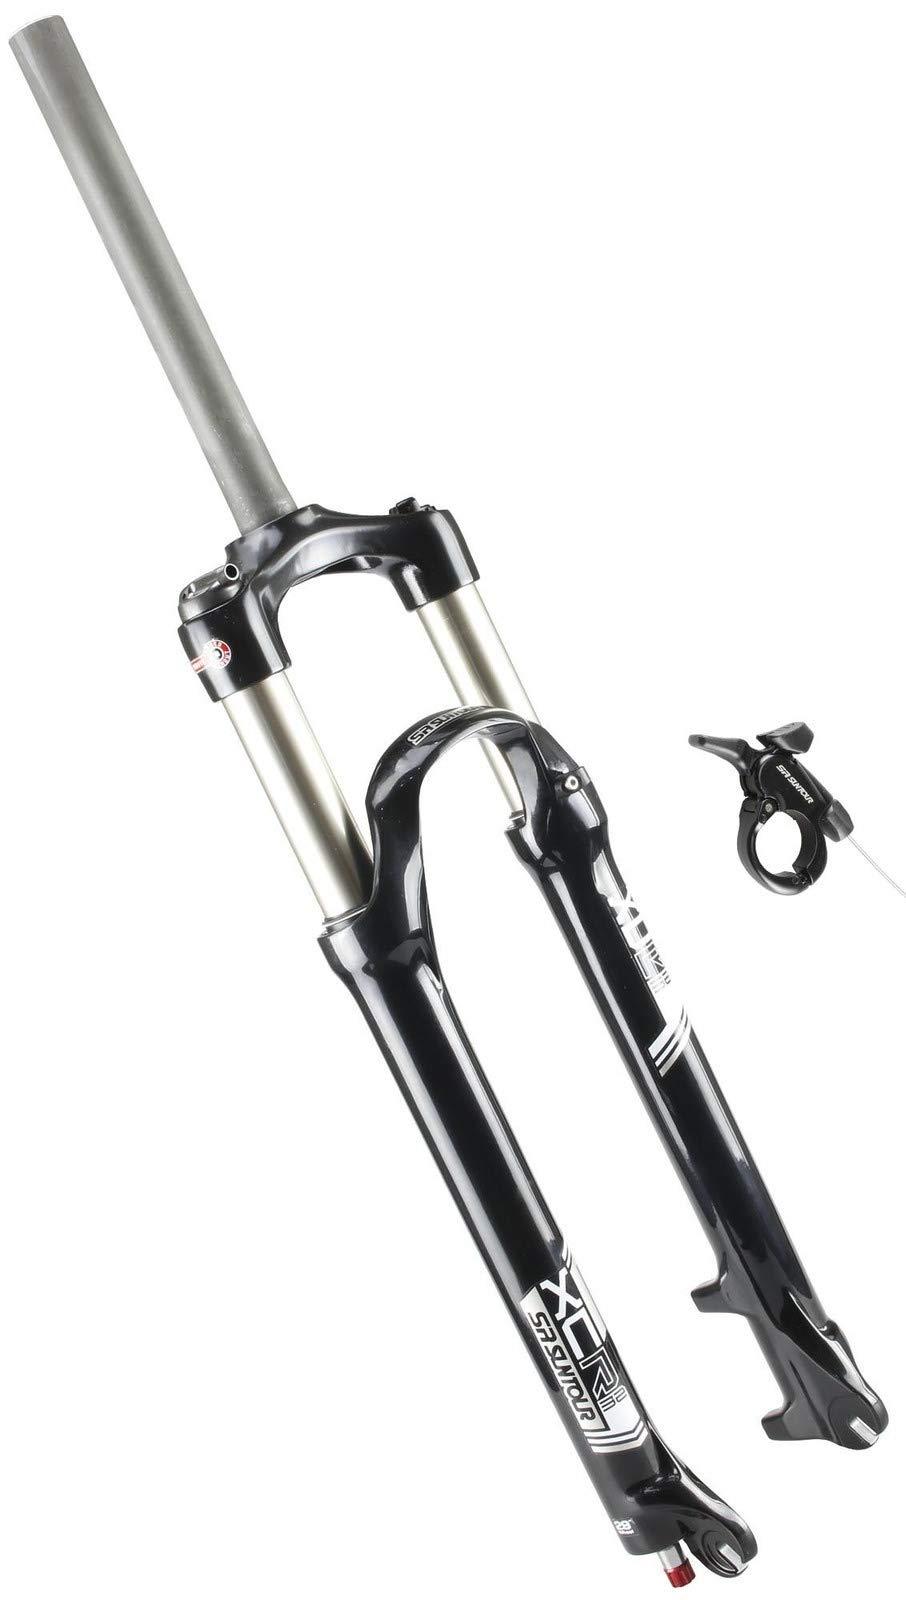 SR Suntour XCR32 Mountian Bike Fork 29er Coil Travel 100mm 9mm QR Remote Lockout by SR Suntour